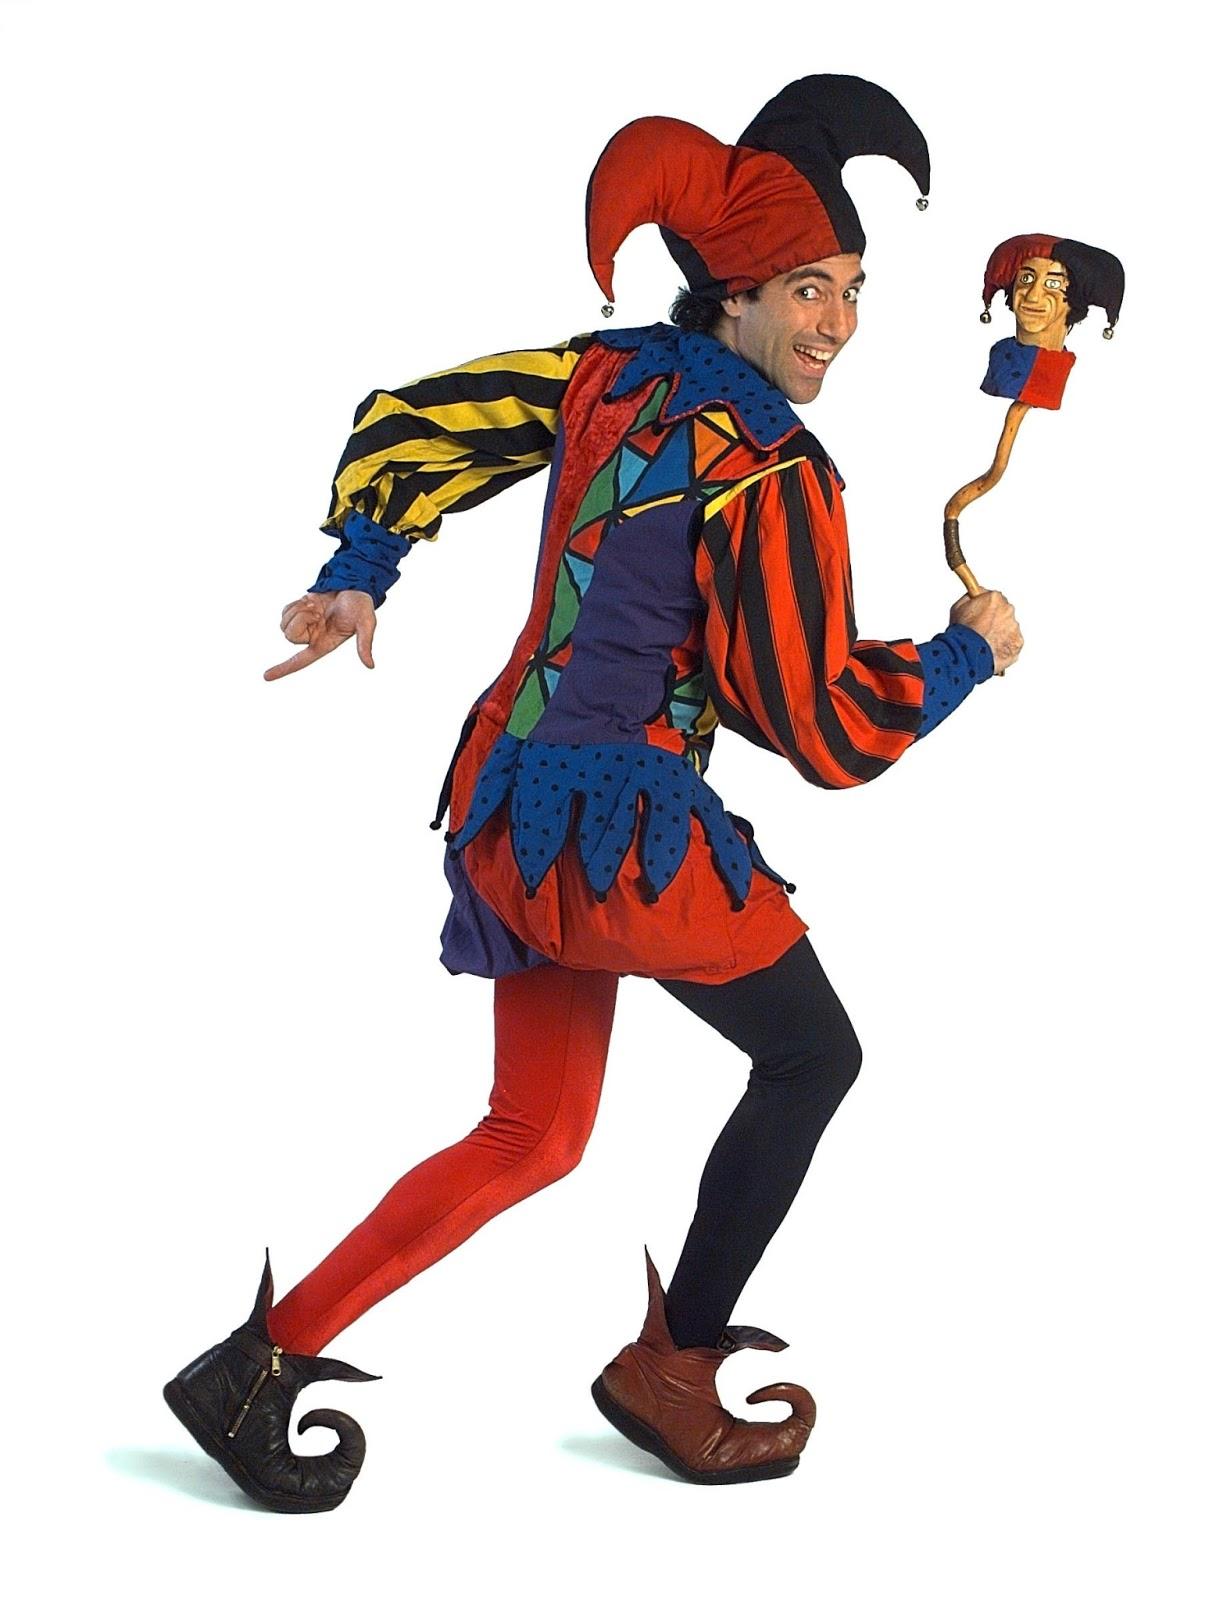 Renaissance clipart jester Make jester trickster to bells